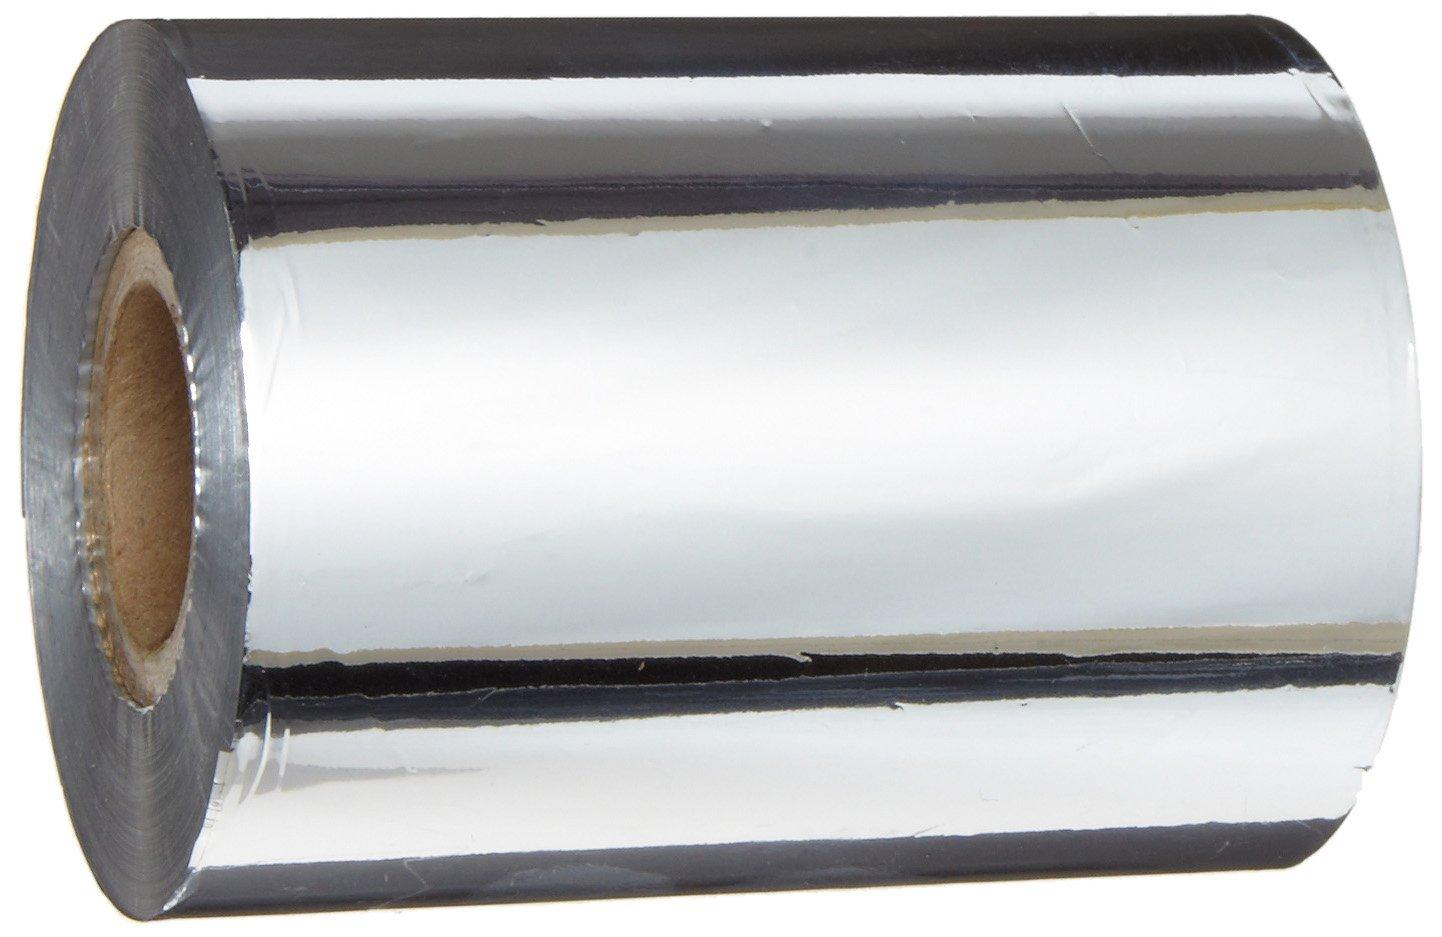 Brady R4502-SV 984' Length x 3.27